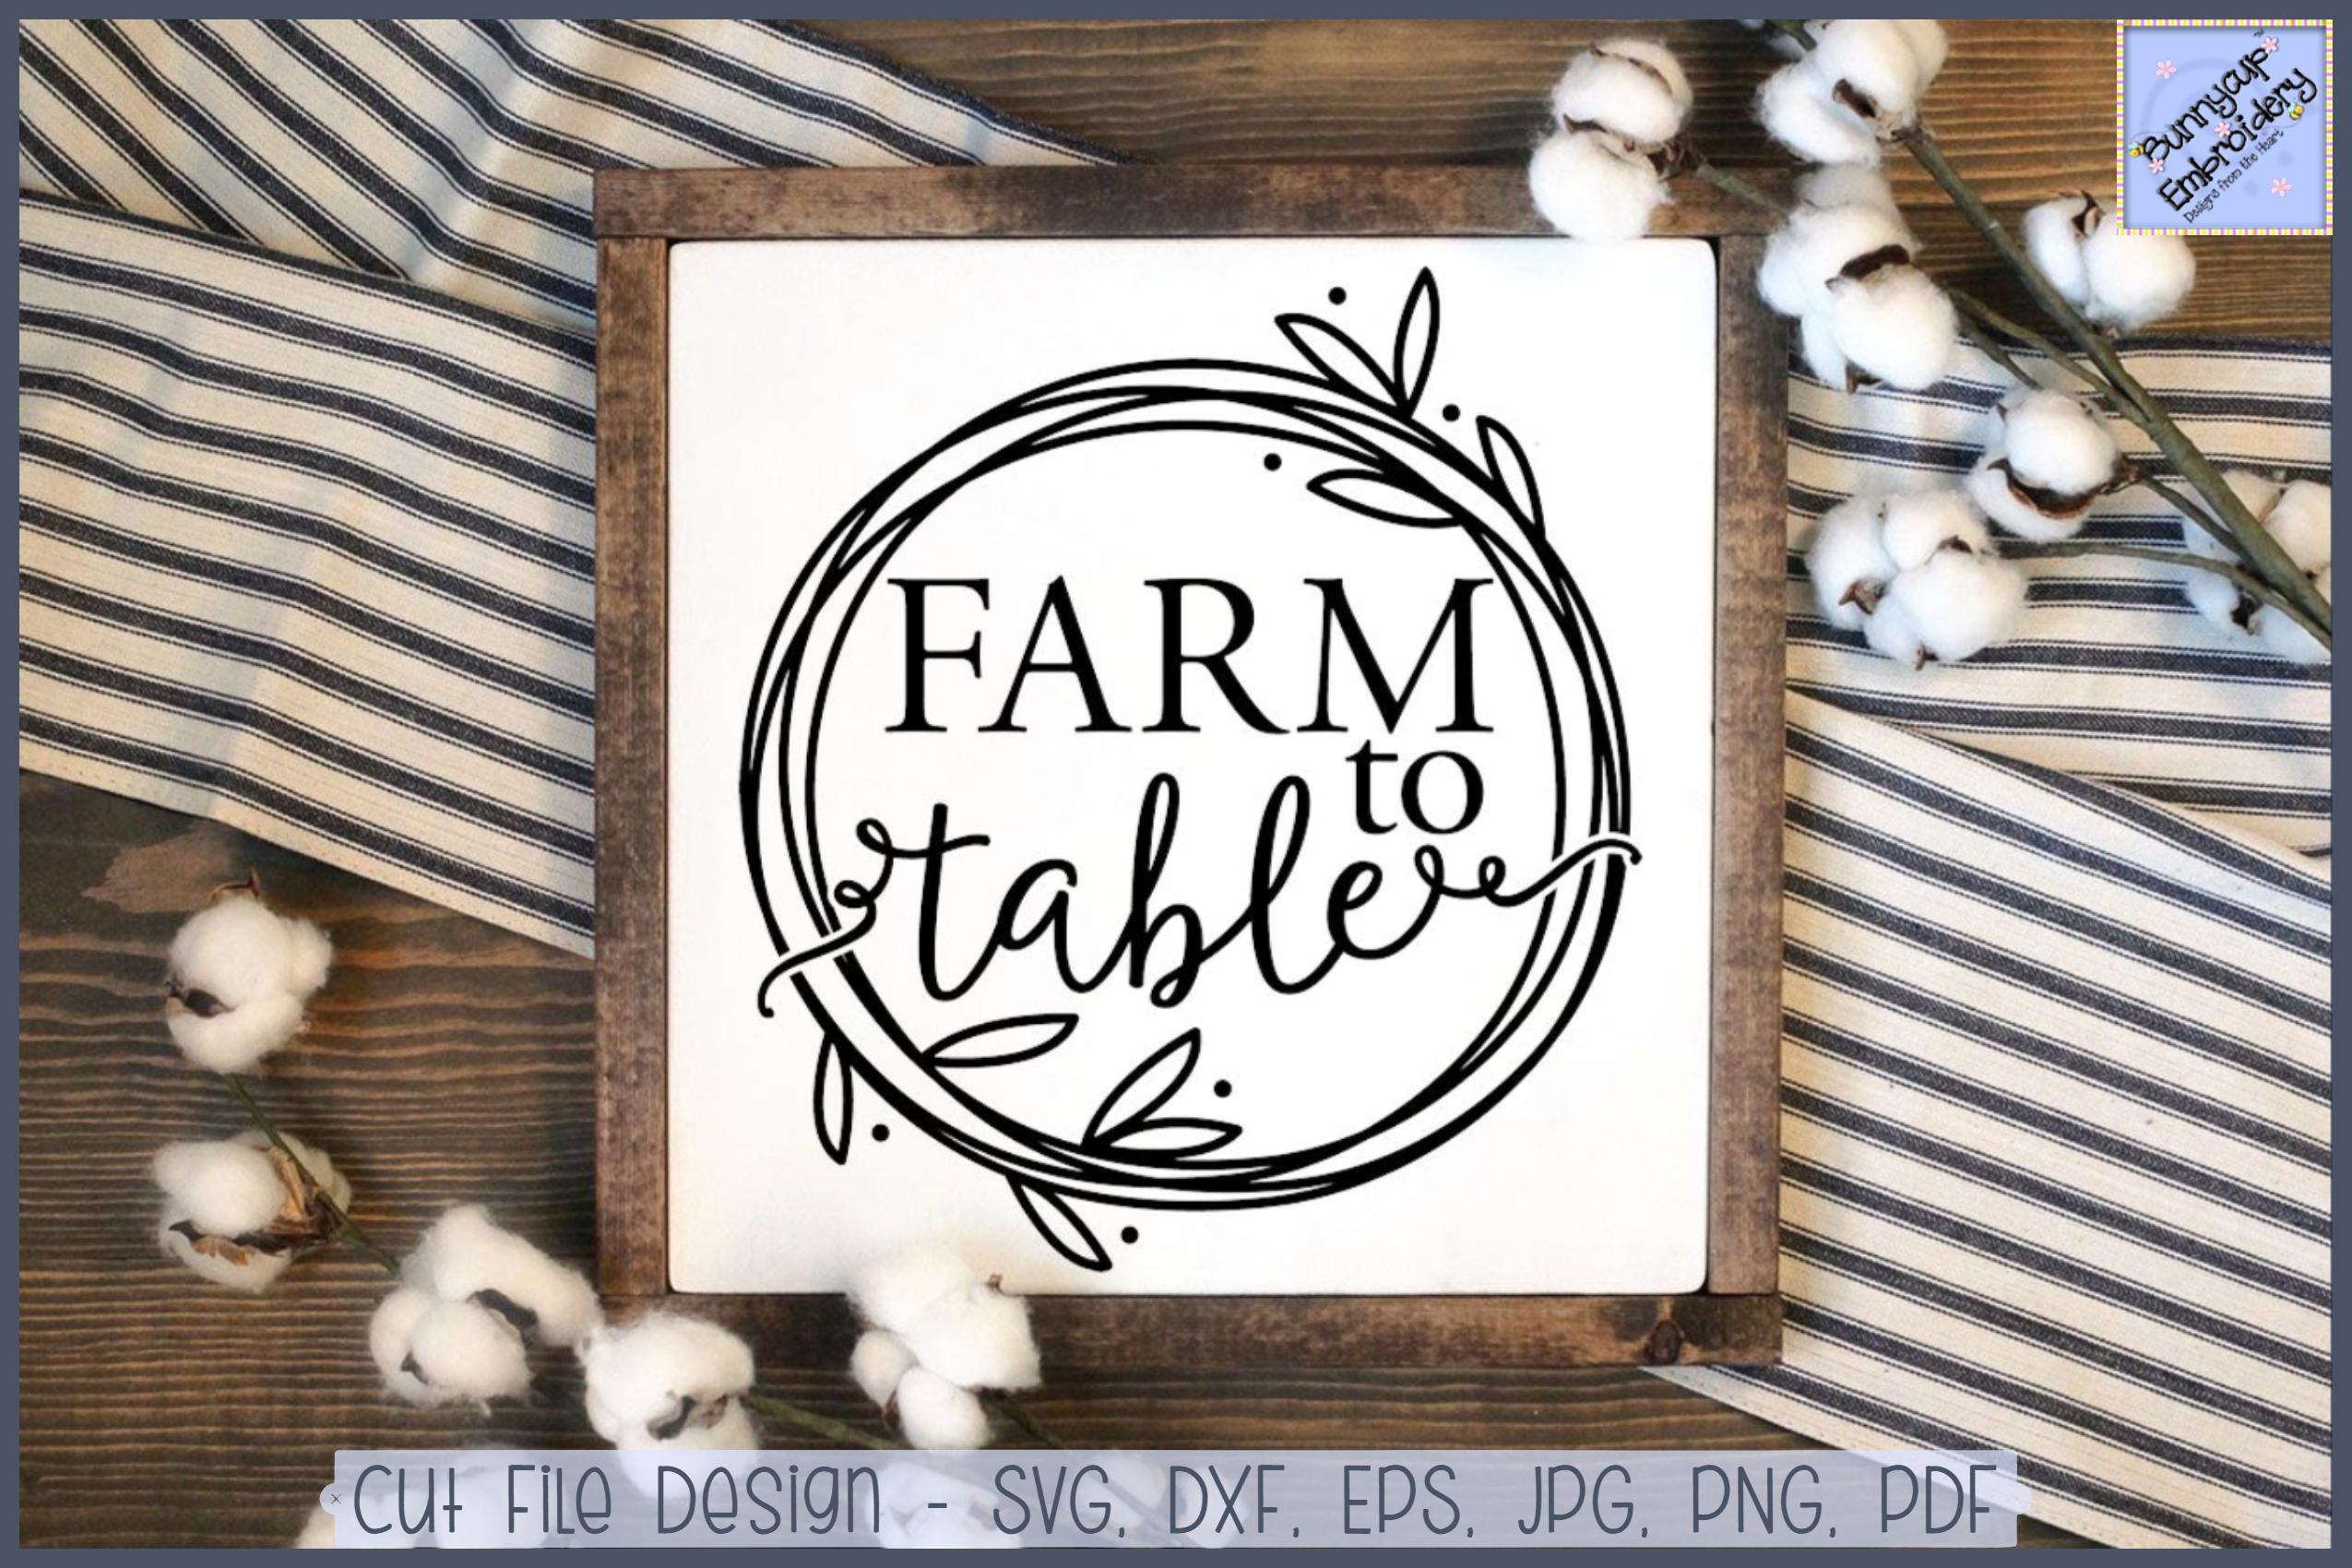 Farmhouse Farm To Table